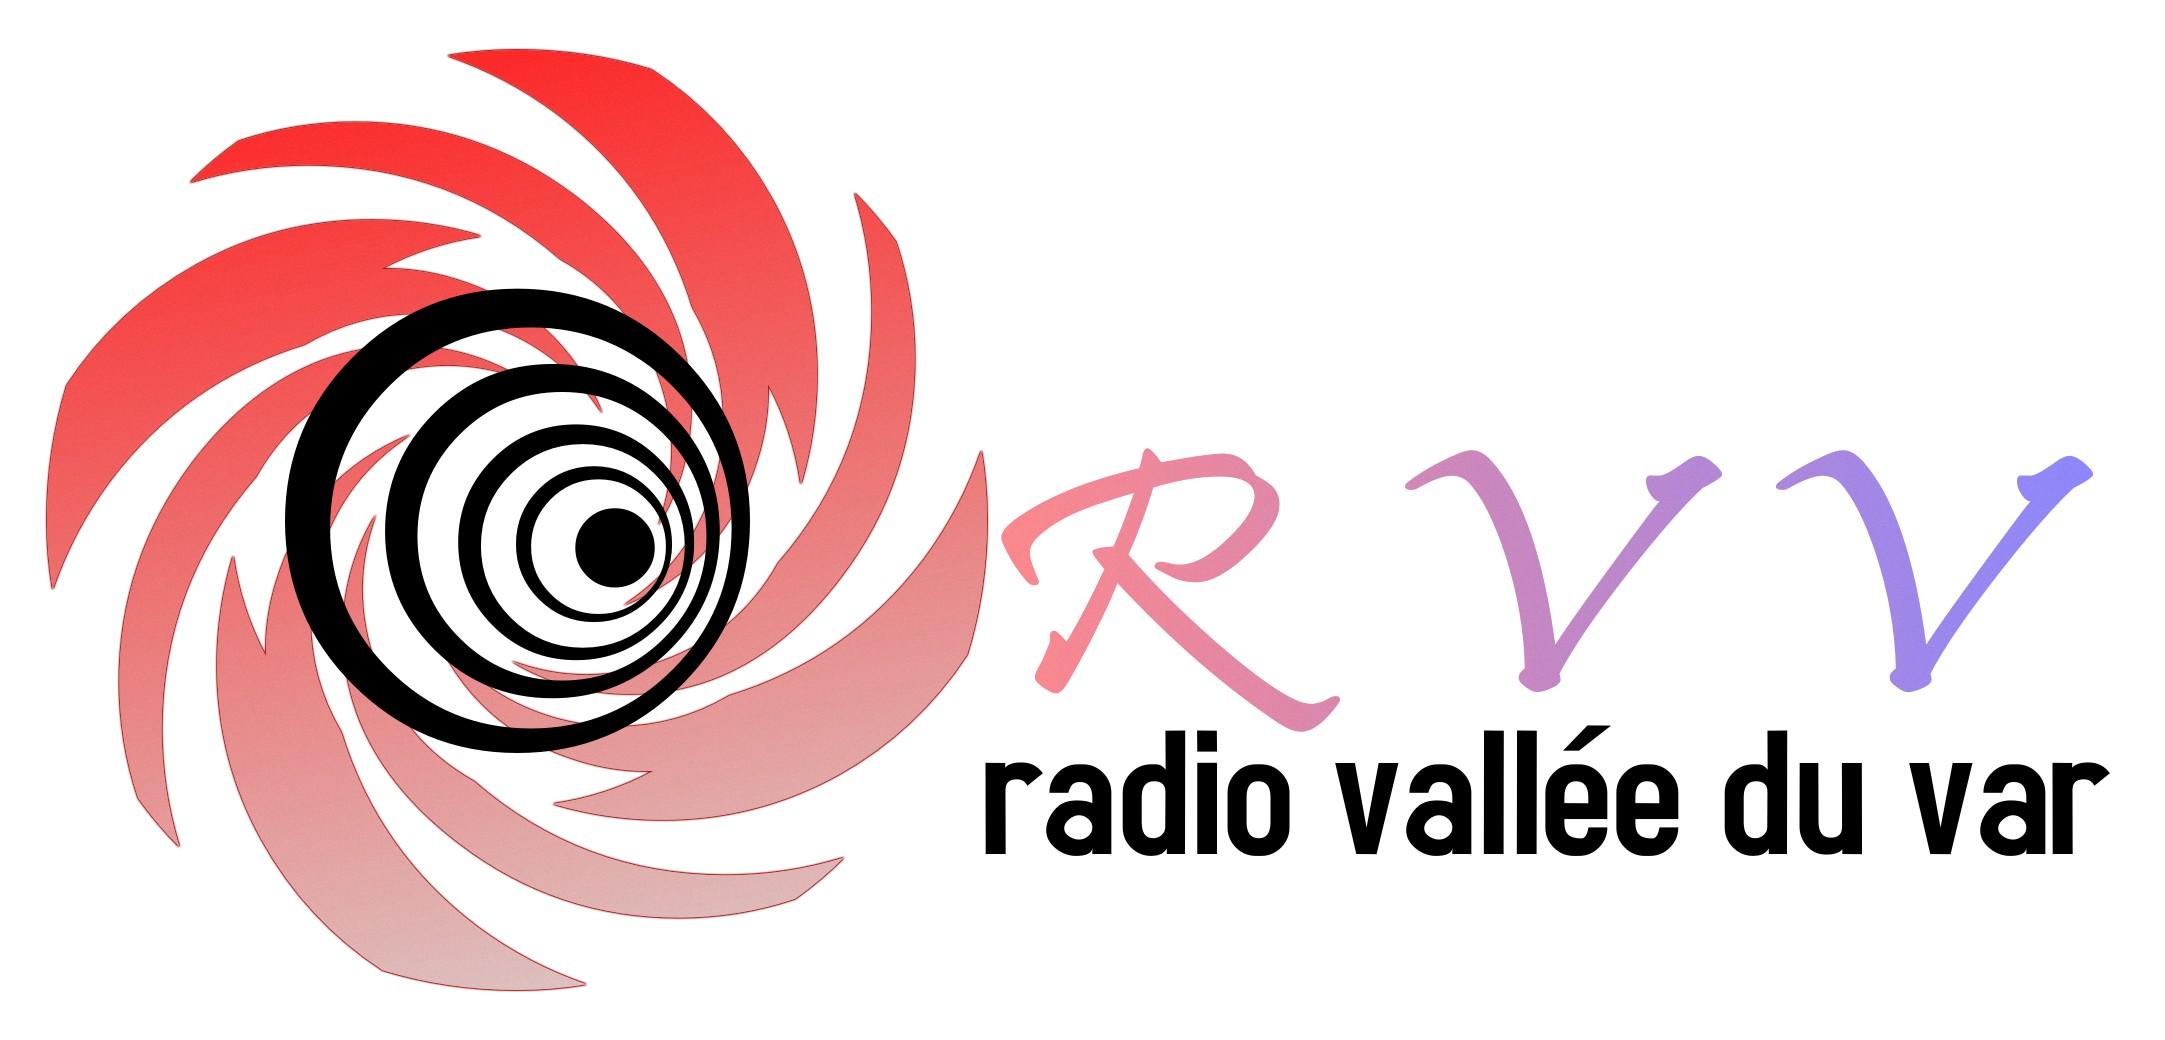 RVV - Radio Vallée du Var